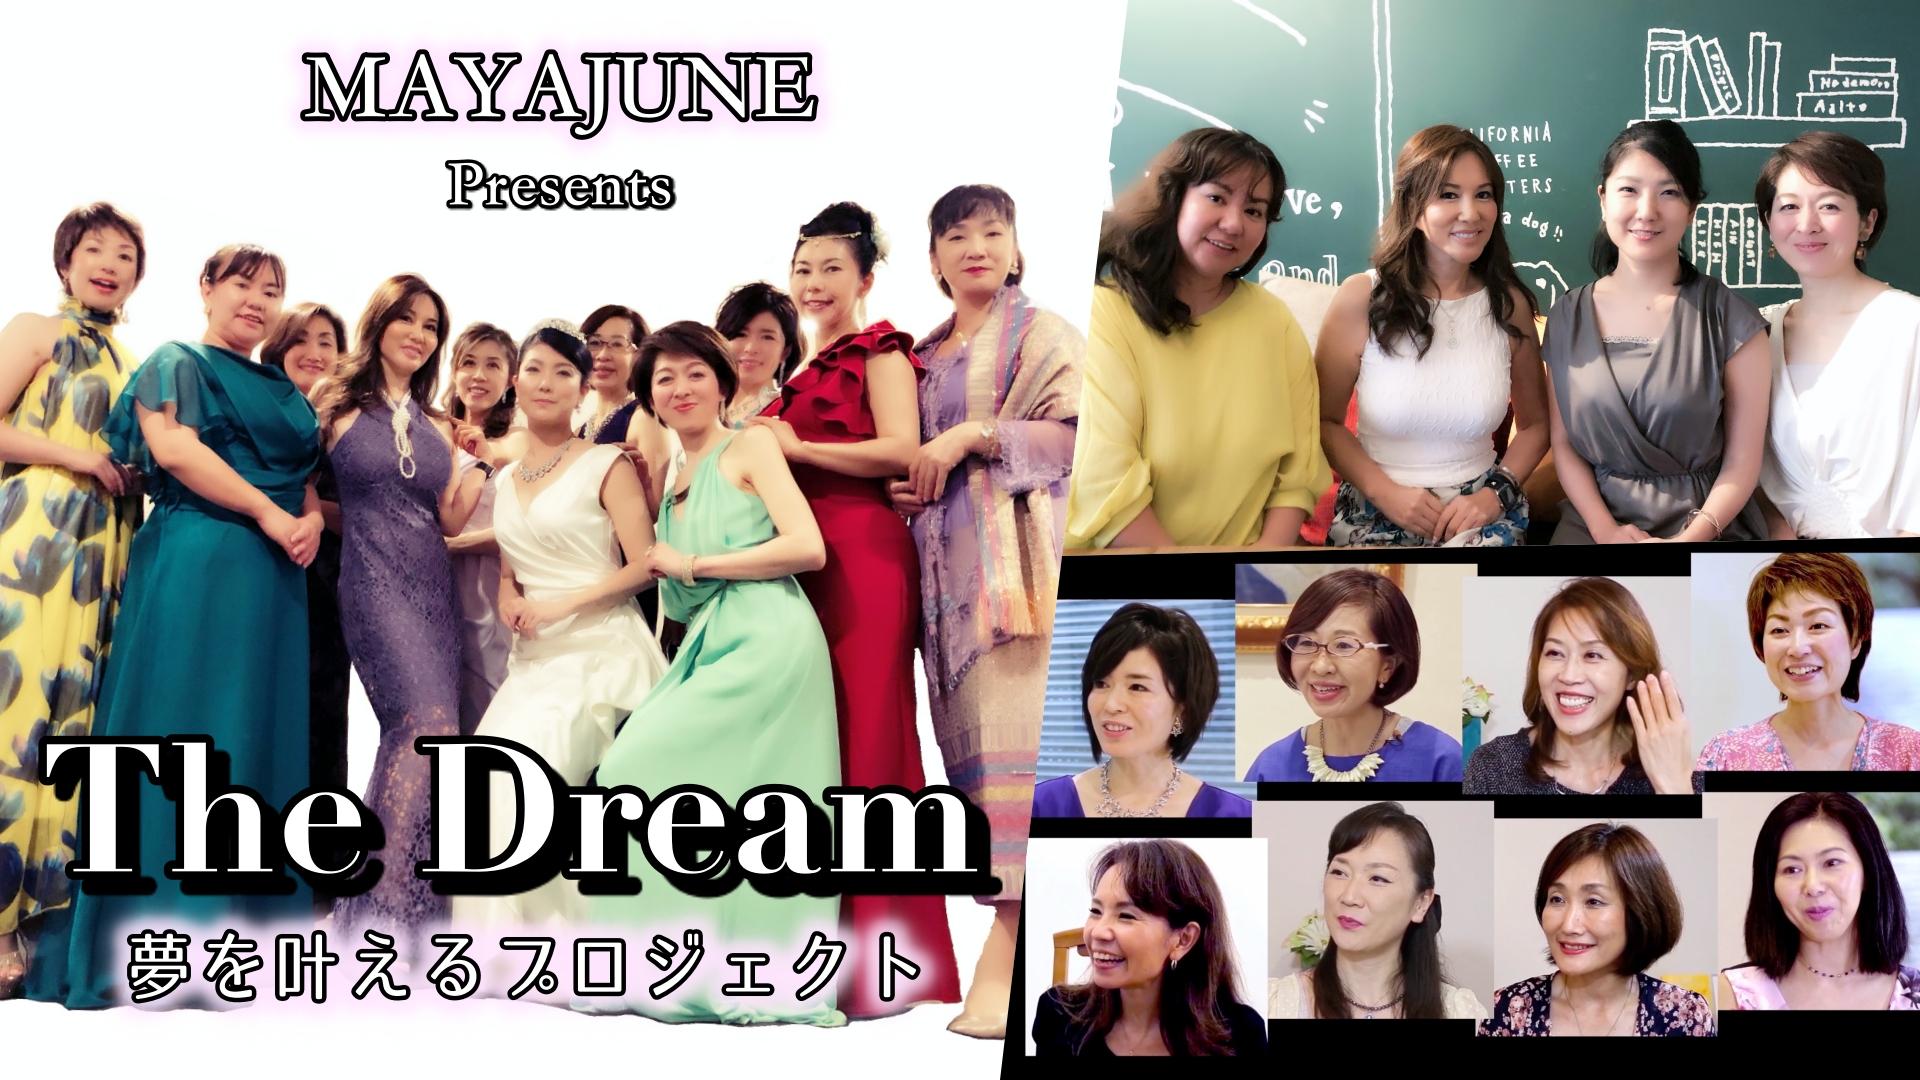 MAYAJUNEのThe Dream 夢を叶えるプロジェクト